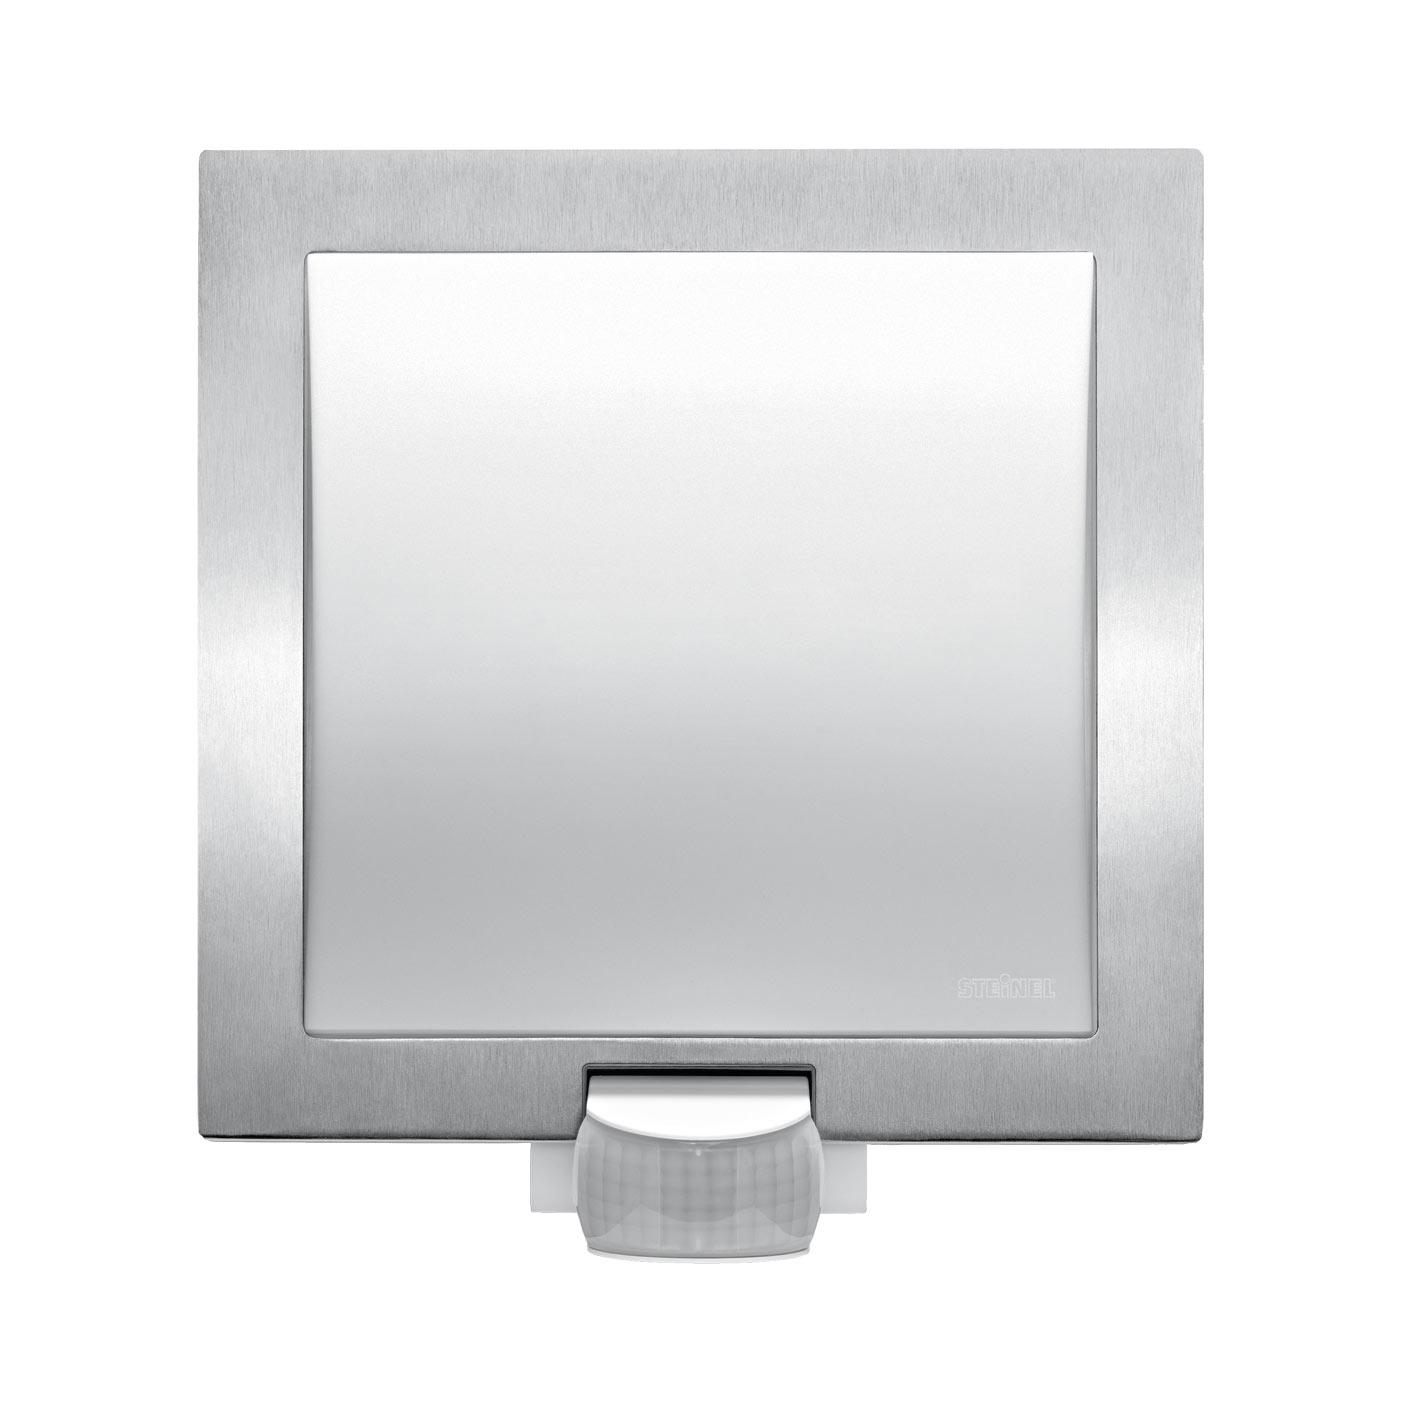 Steinel L20 S RVS sensorlamp